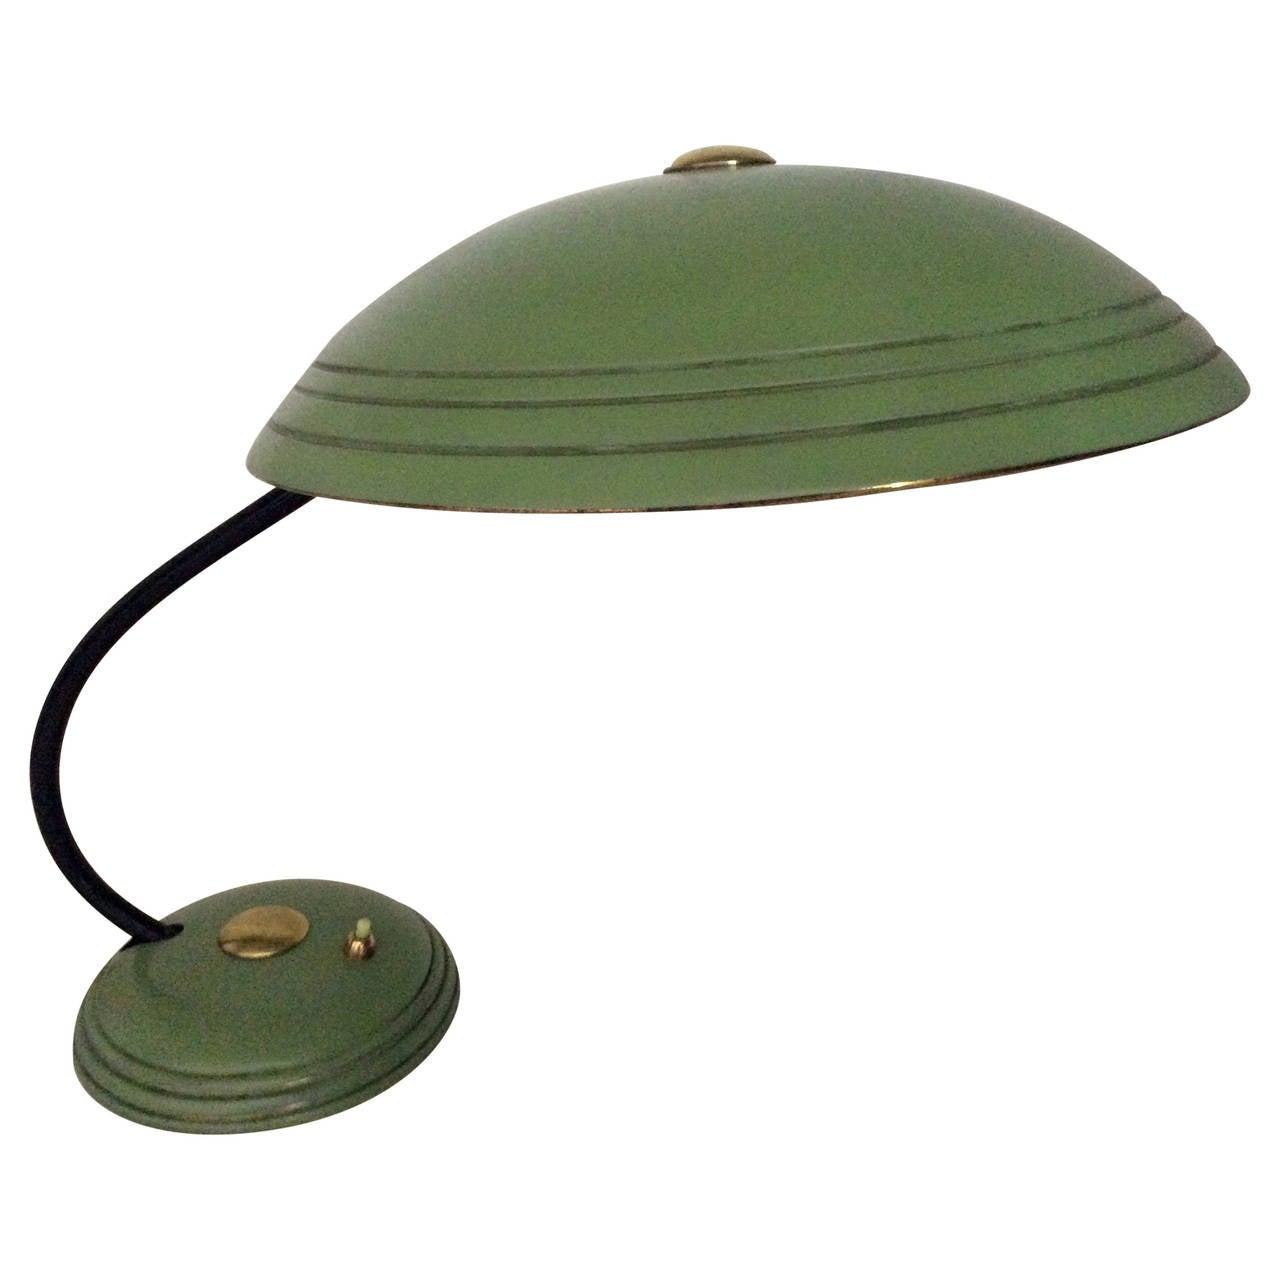 Helo flying saucer desk lamp at 1stdibs helo flying saucer desk lamp 1 arubaitofo Images